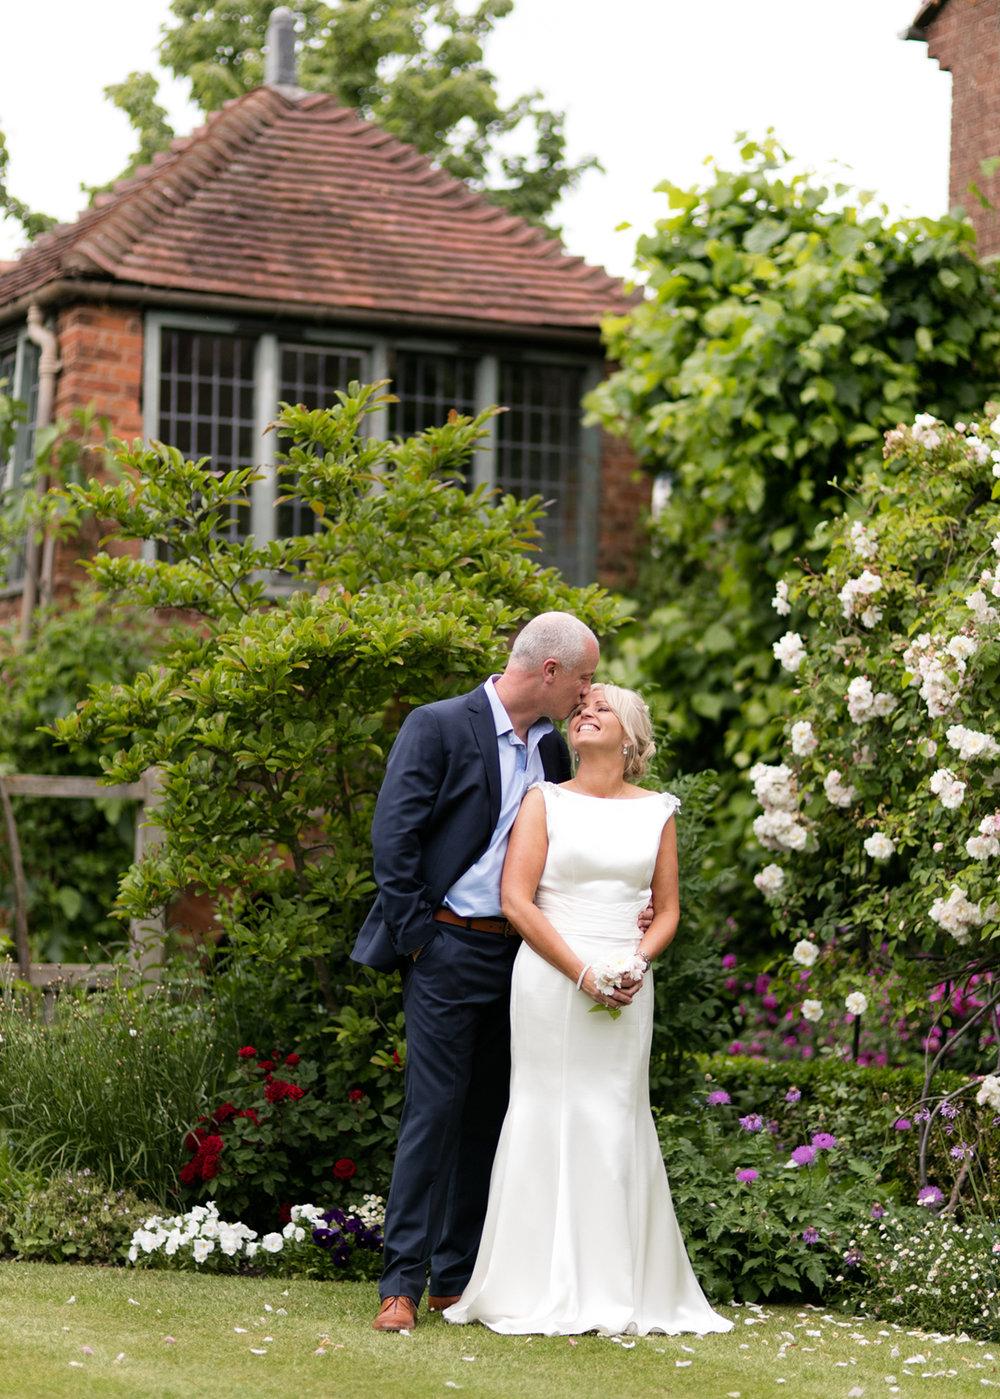 Wedding-Photography-Lord-Leycester-Hospital20.jpg